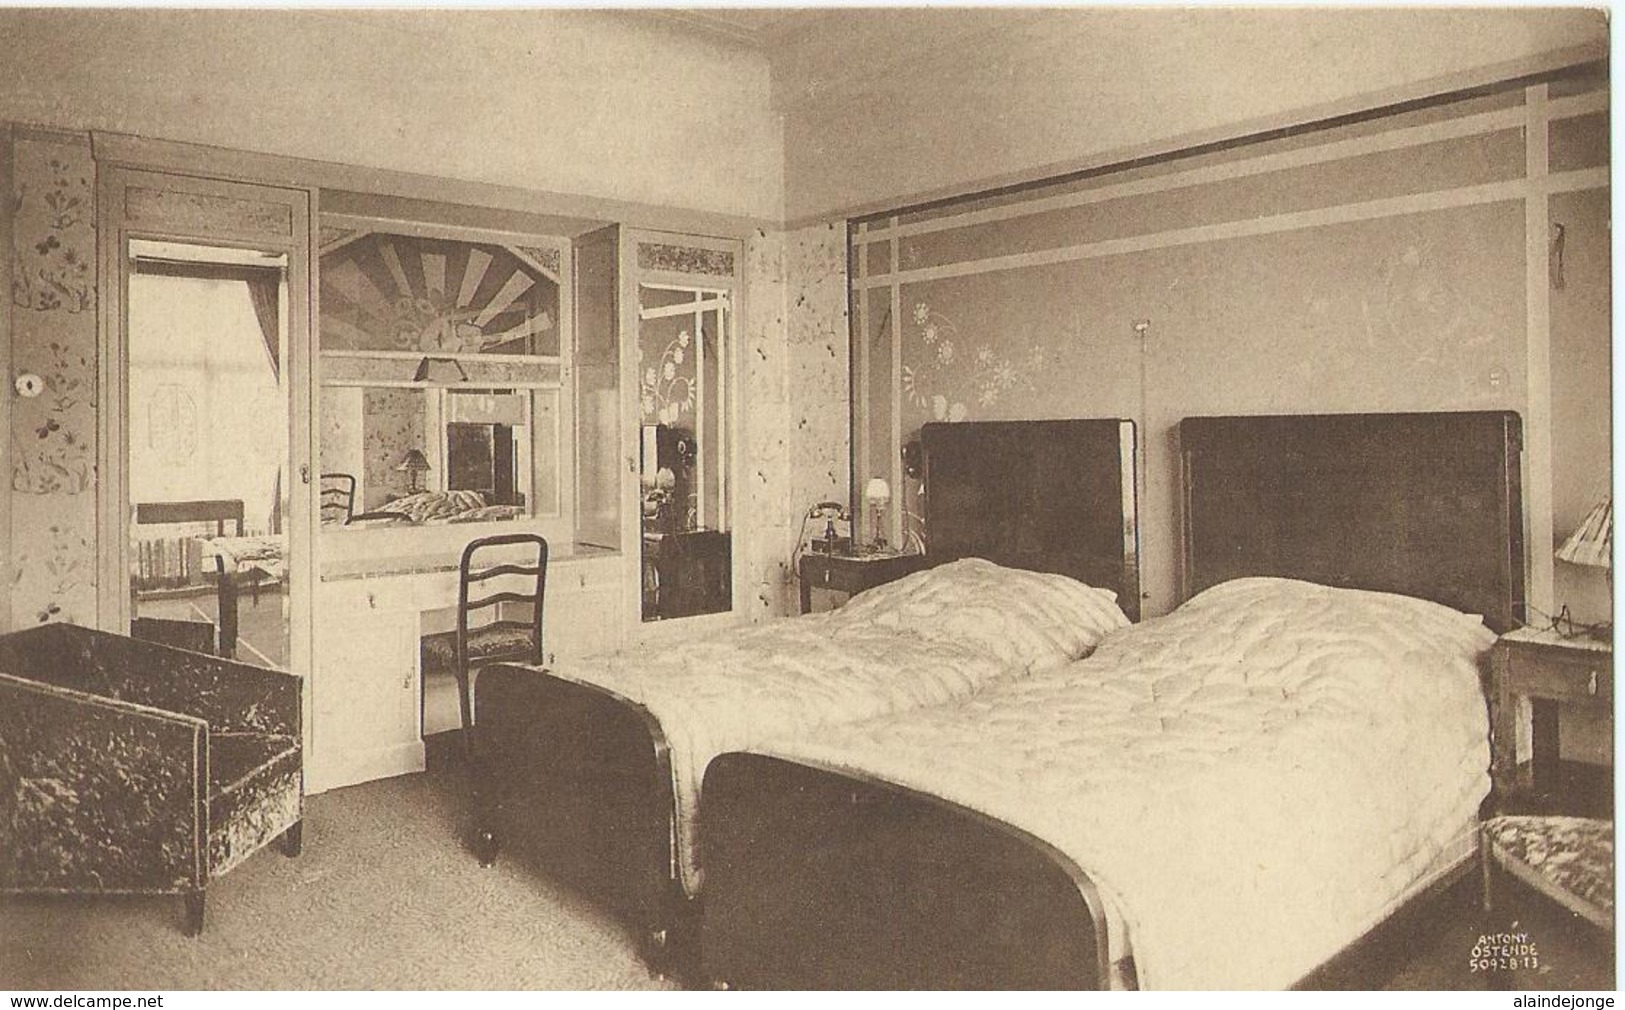 Oostende - Ostende - Hôtel Imperial - Antony Ostende 50928-13 - Oostende